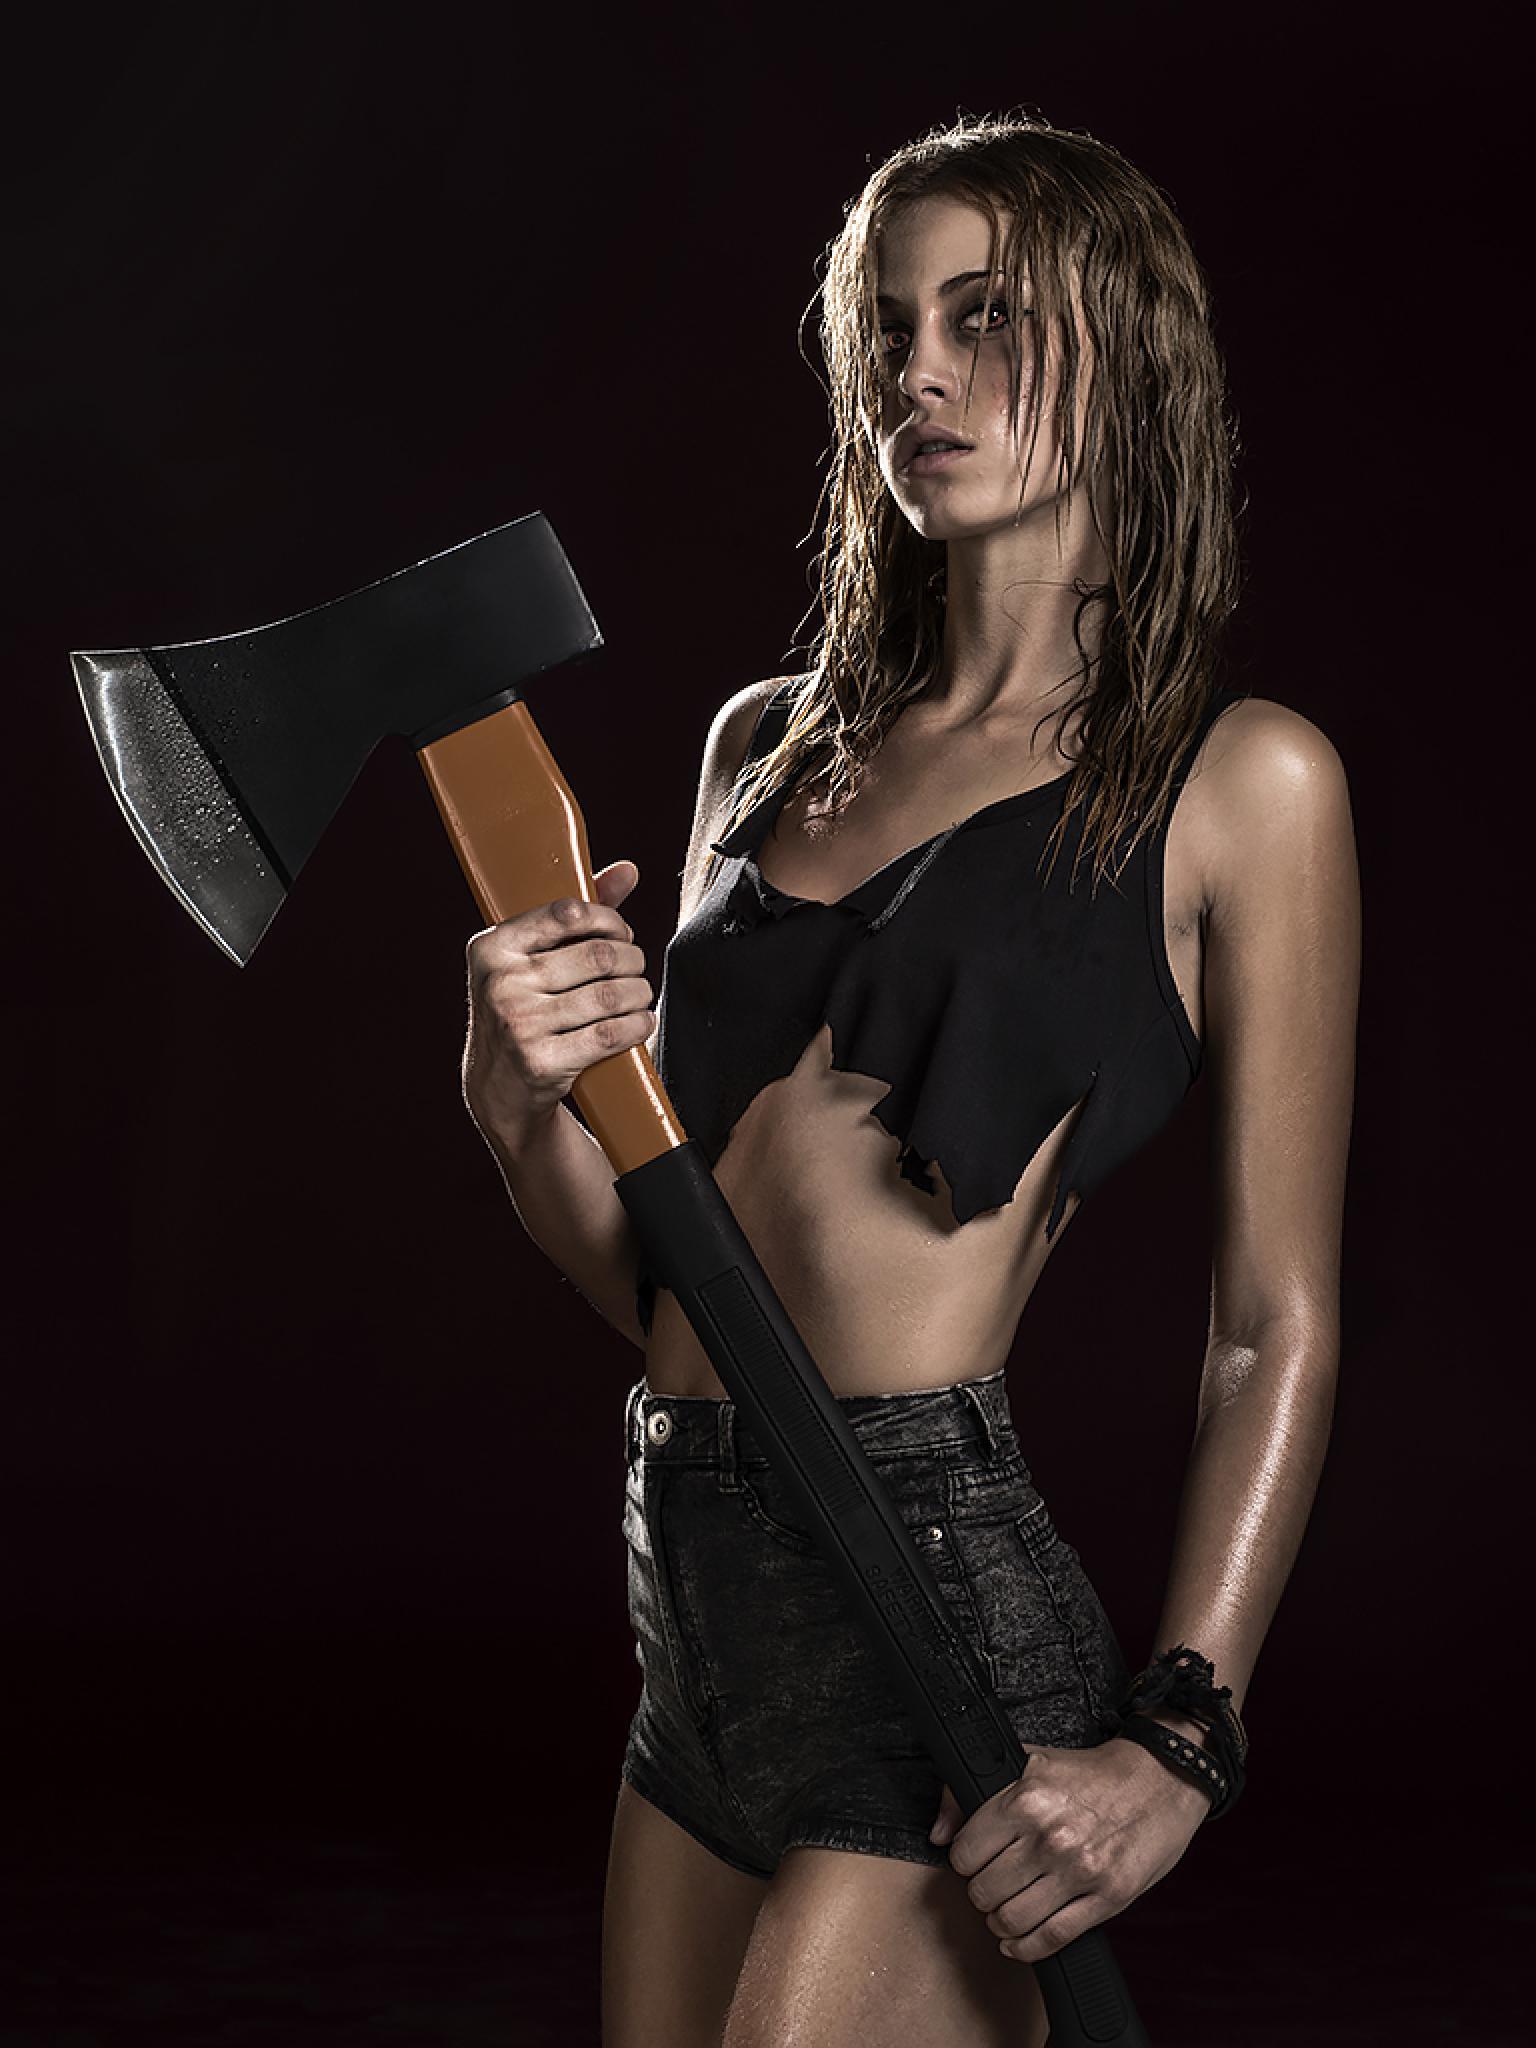 Sexy killer by JMValiente